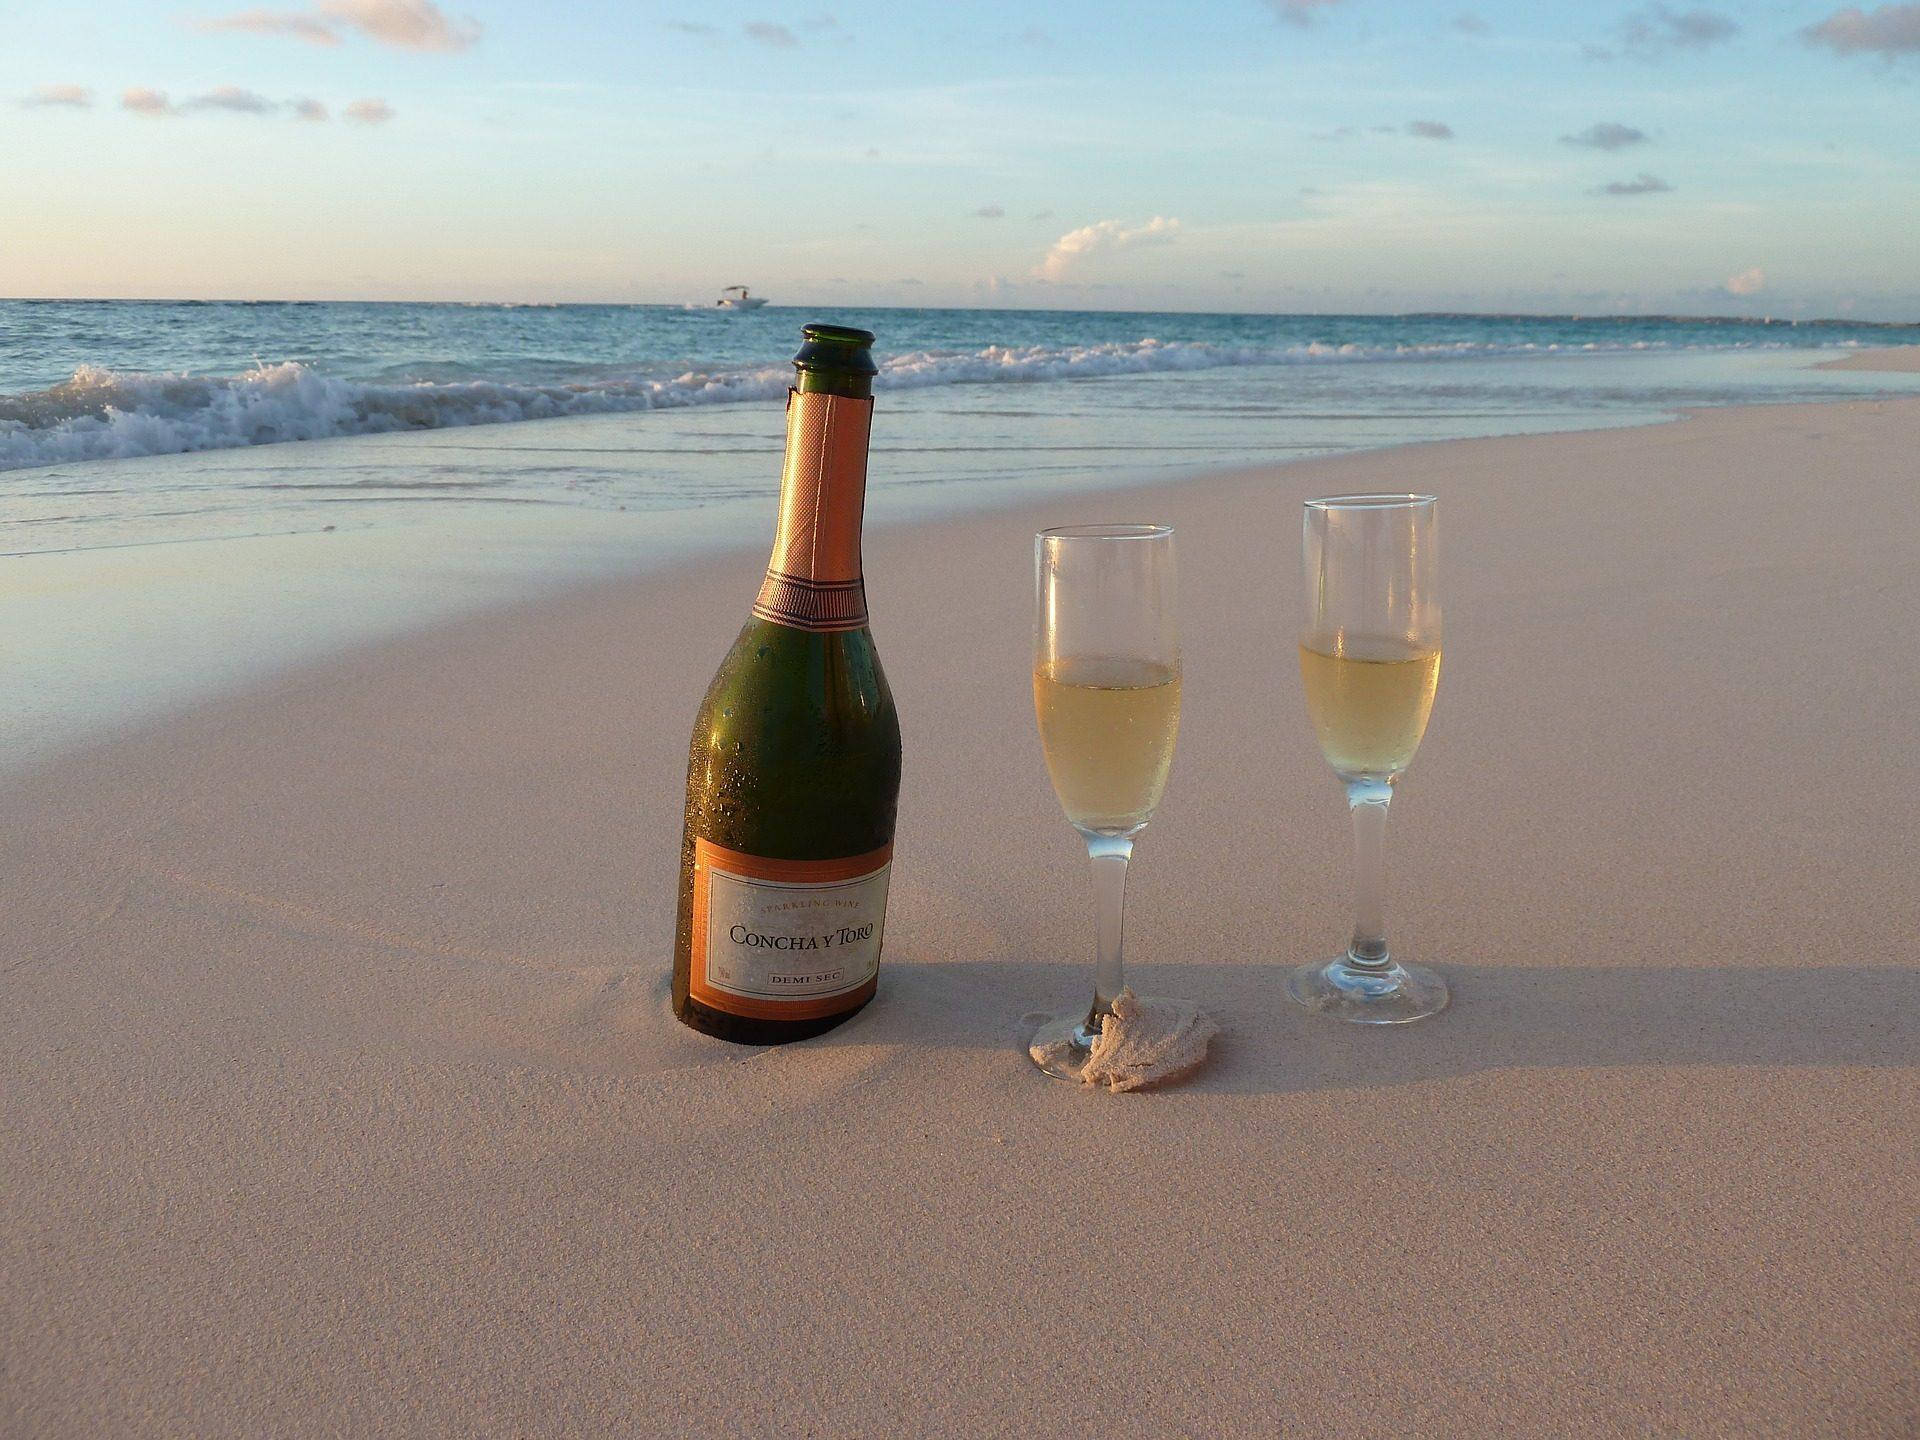 champán, copas, arena, playa, mar, romántico - Fondos de Pantalla HD - professor-falken.com